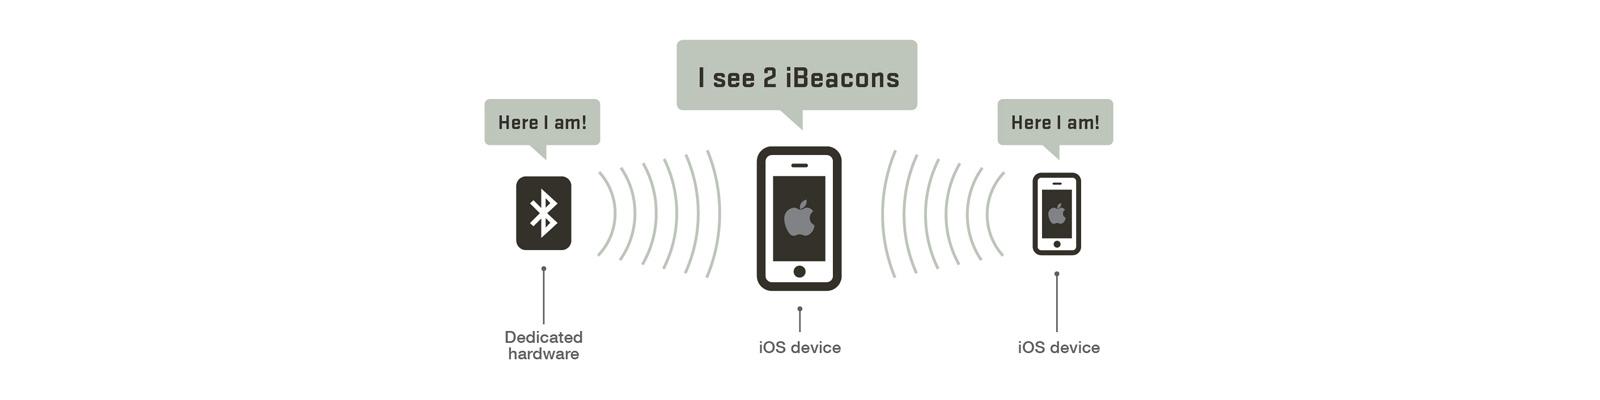 beacon app development company